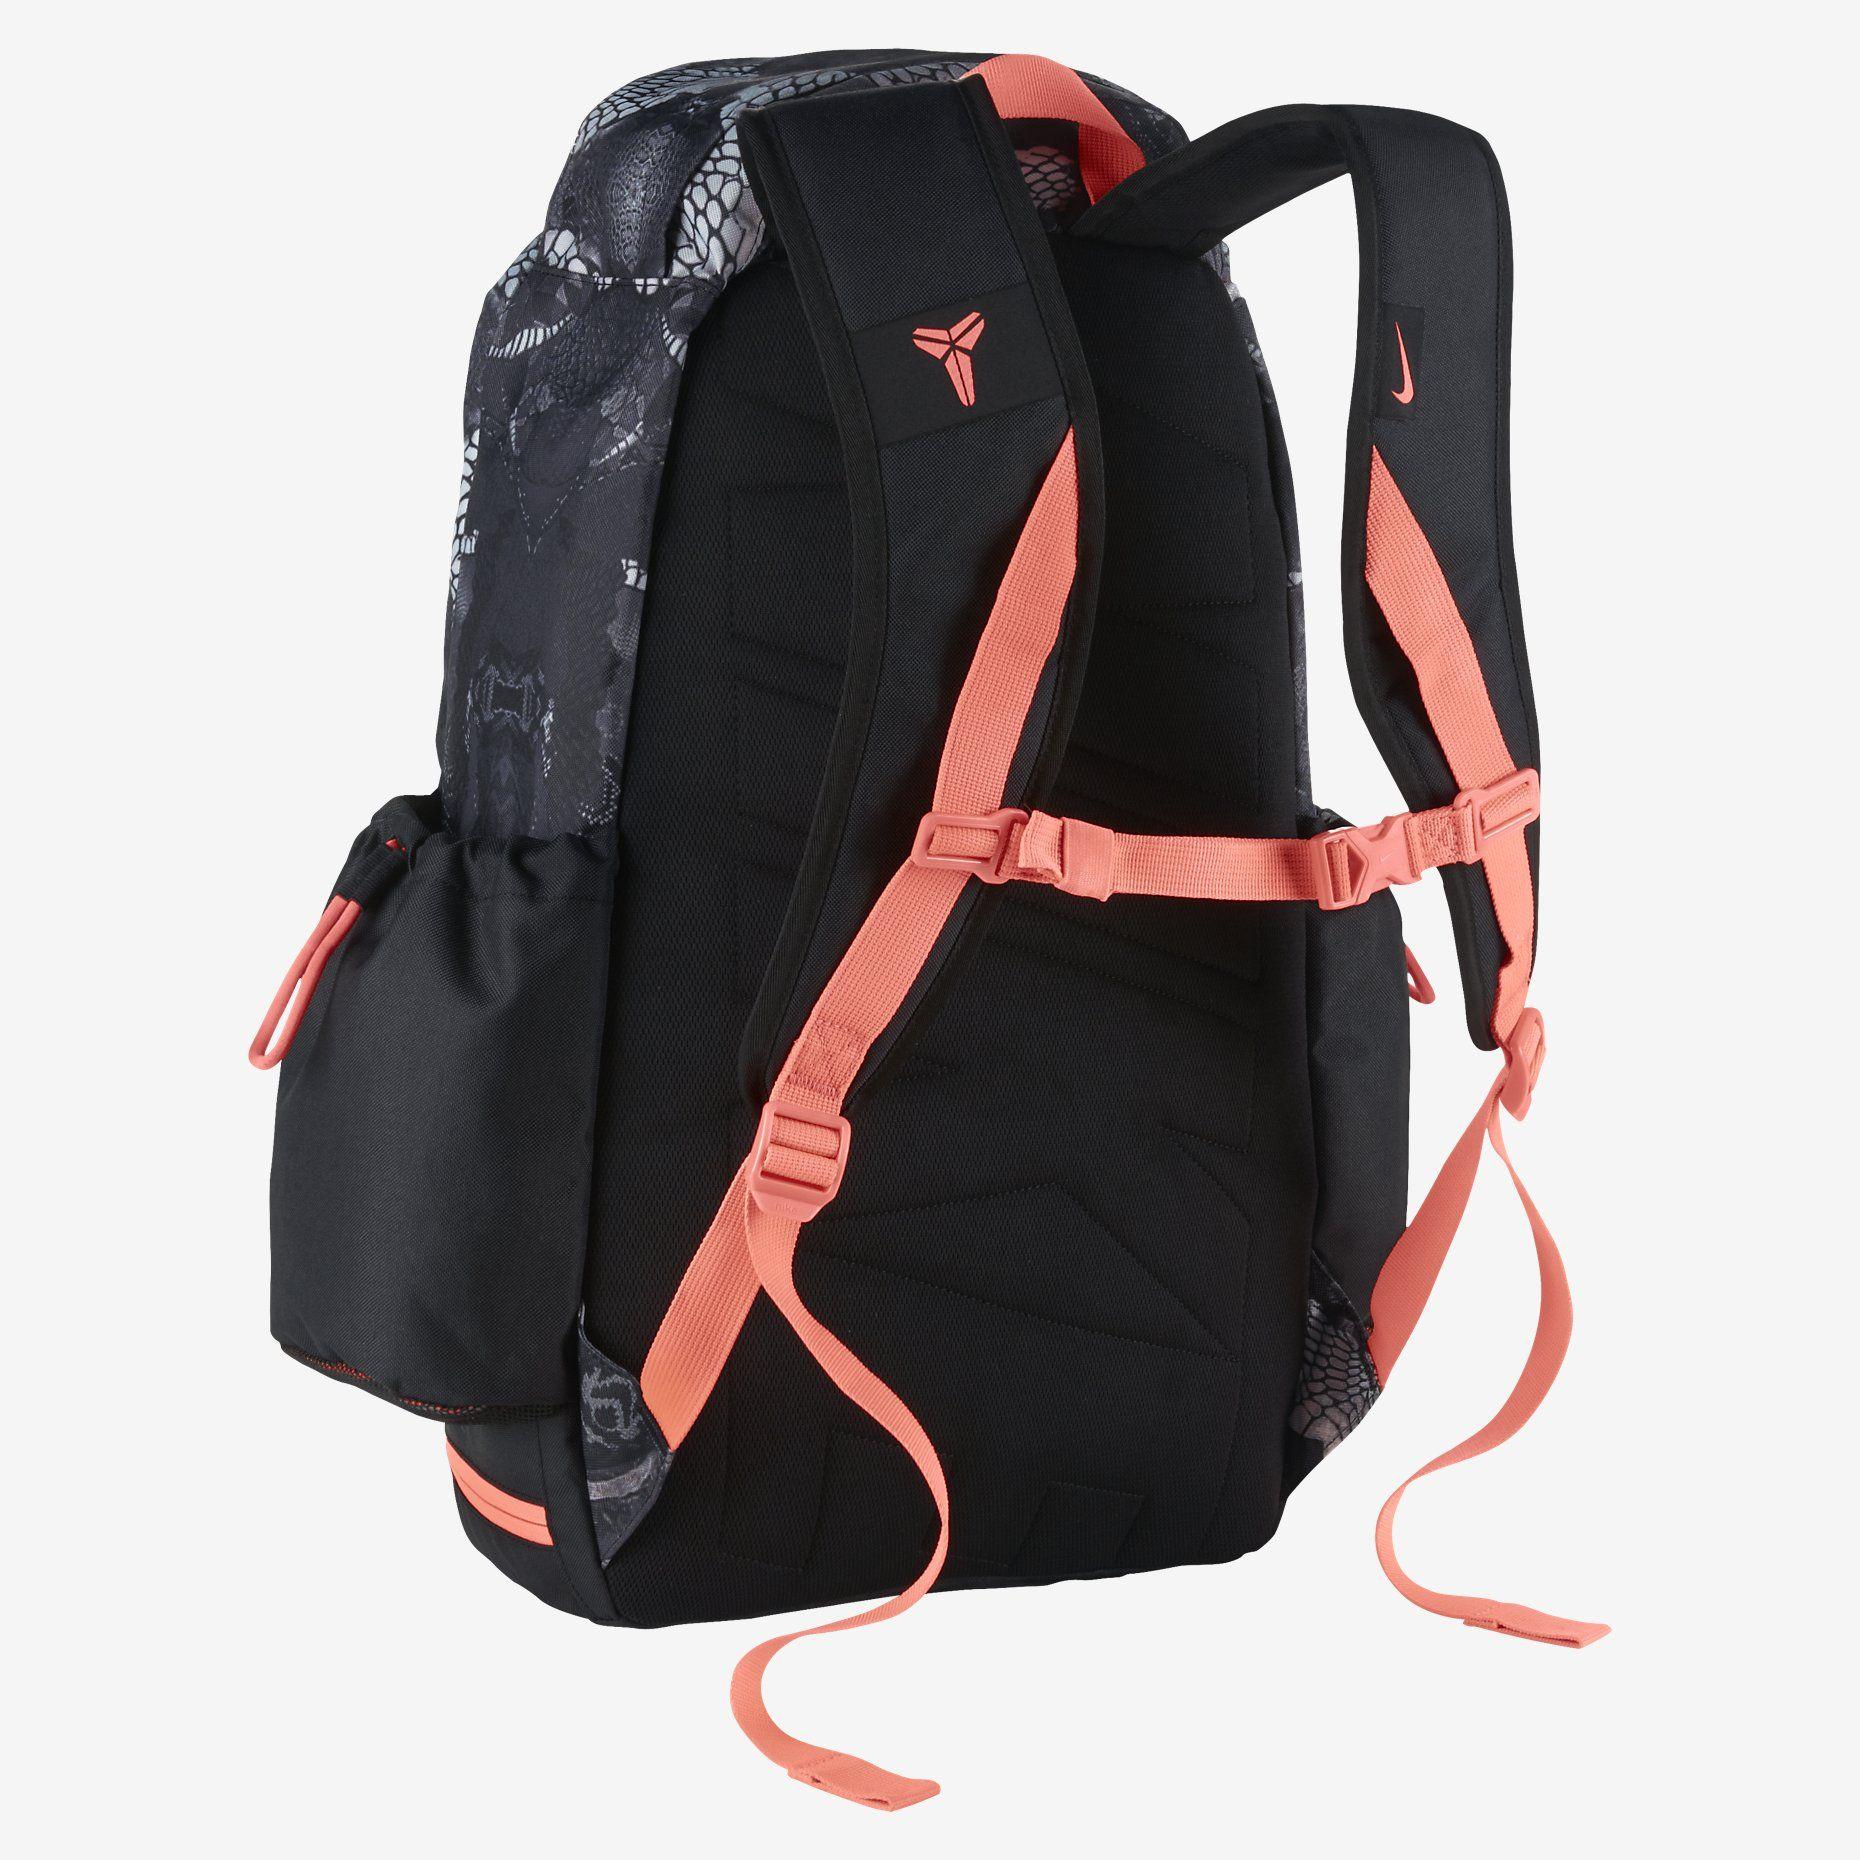 Nike Kobe Mamba Basketball Backpack Dove Grey Black Hot Lava